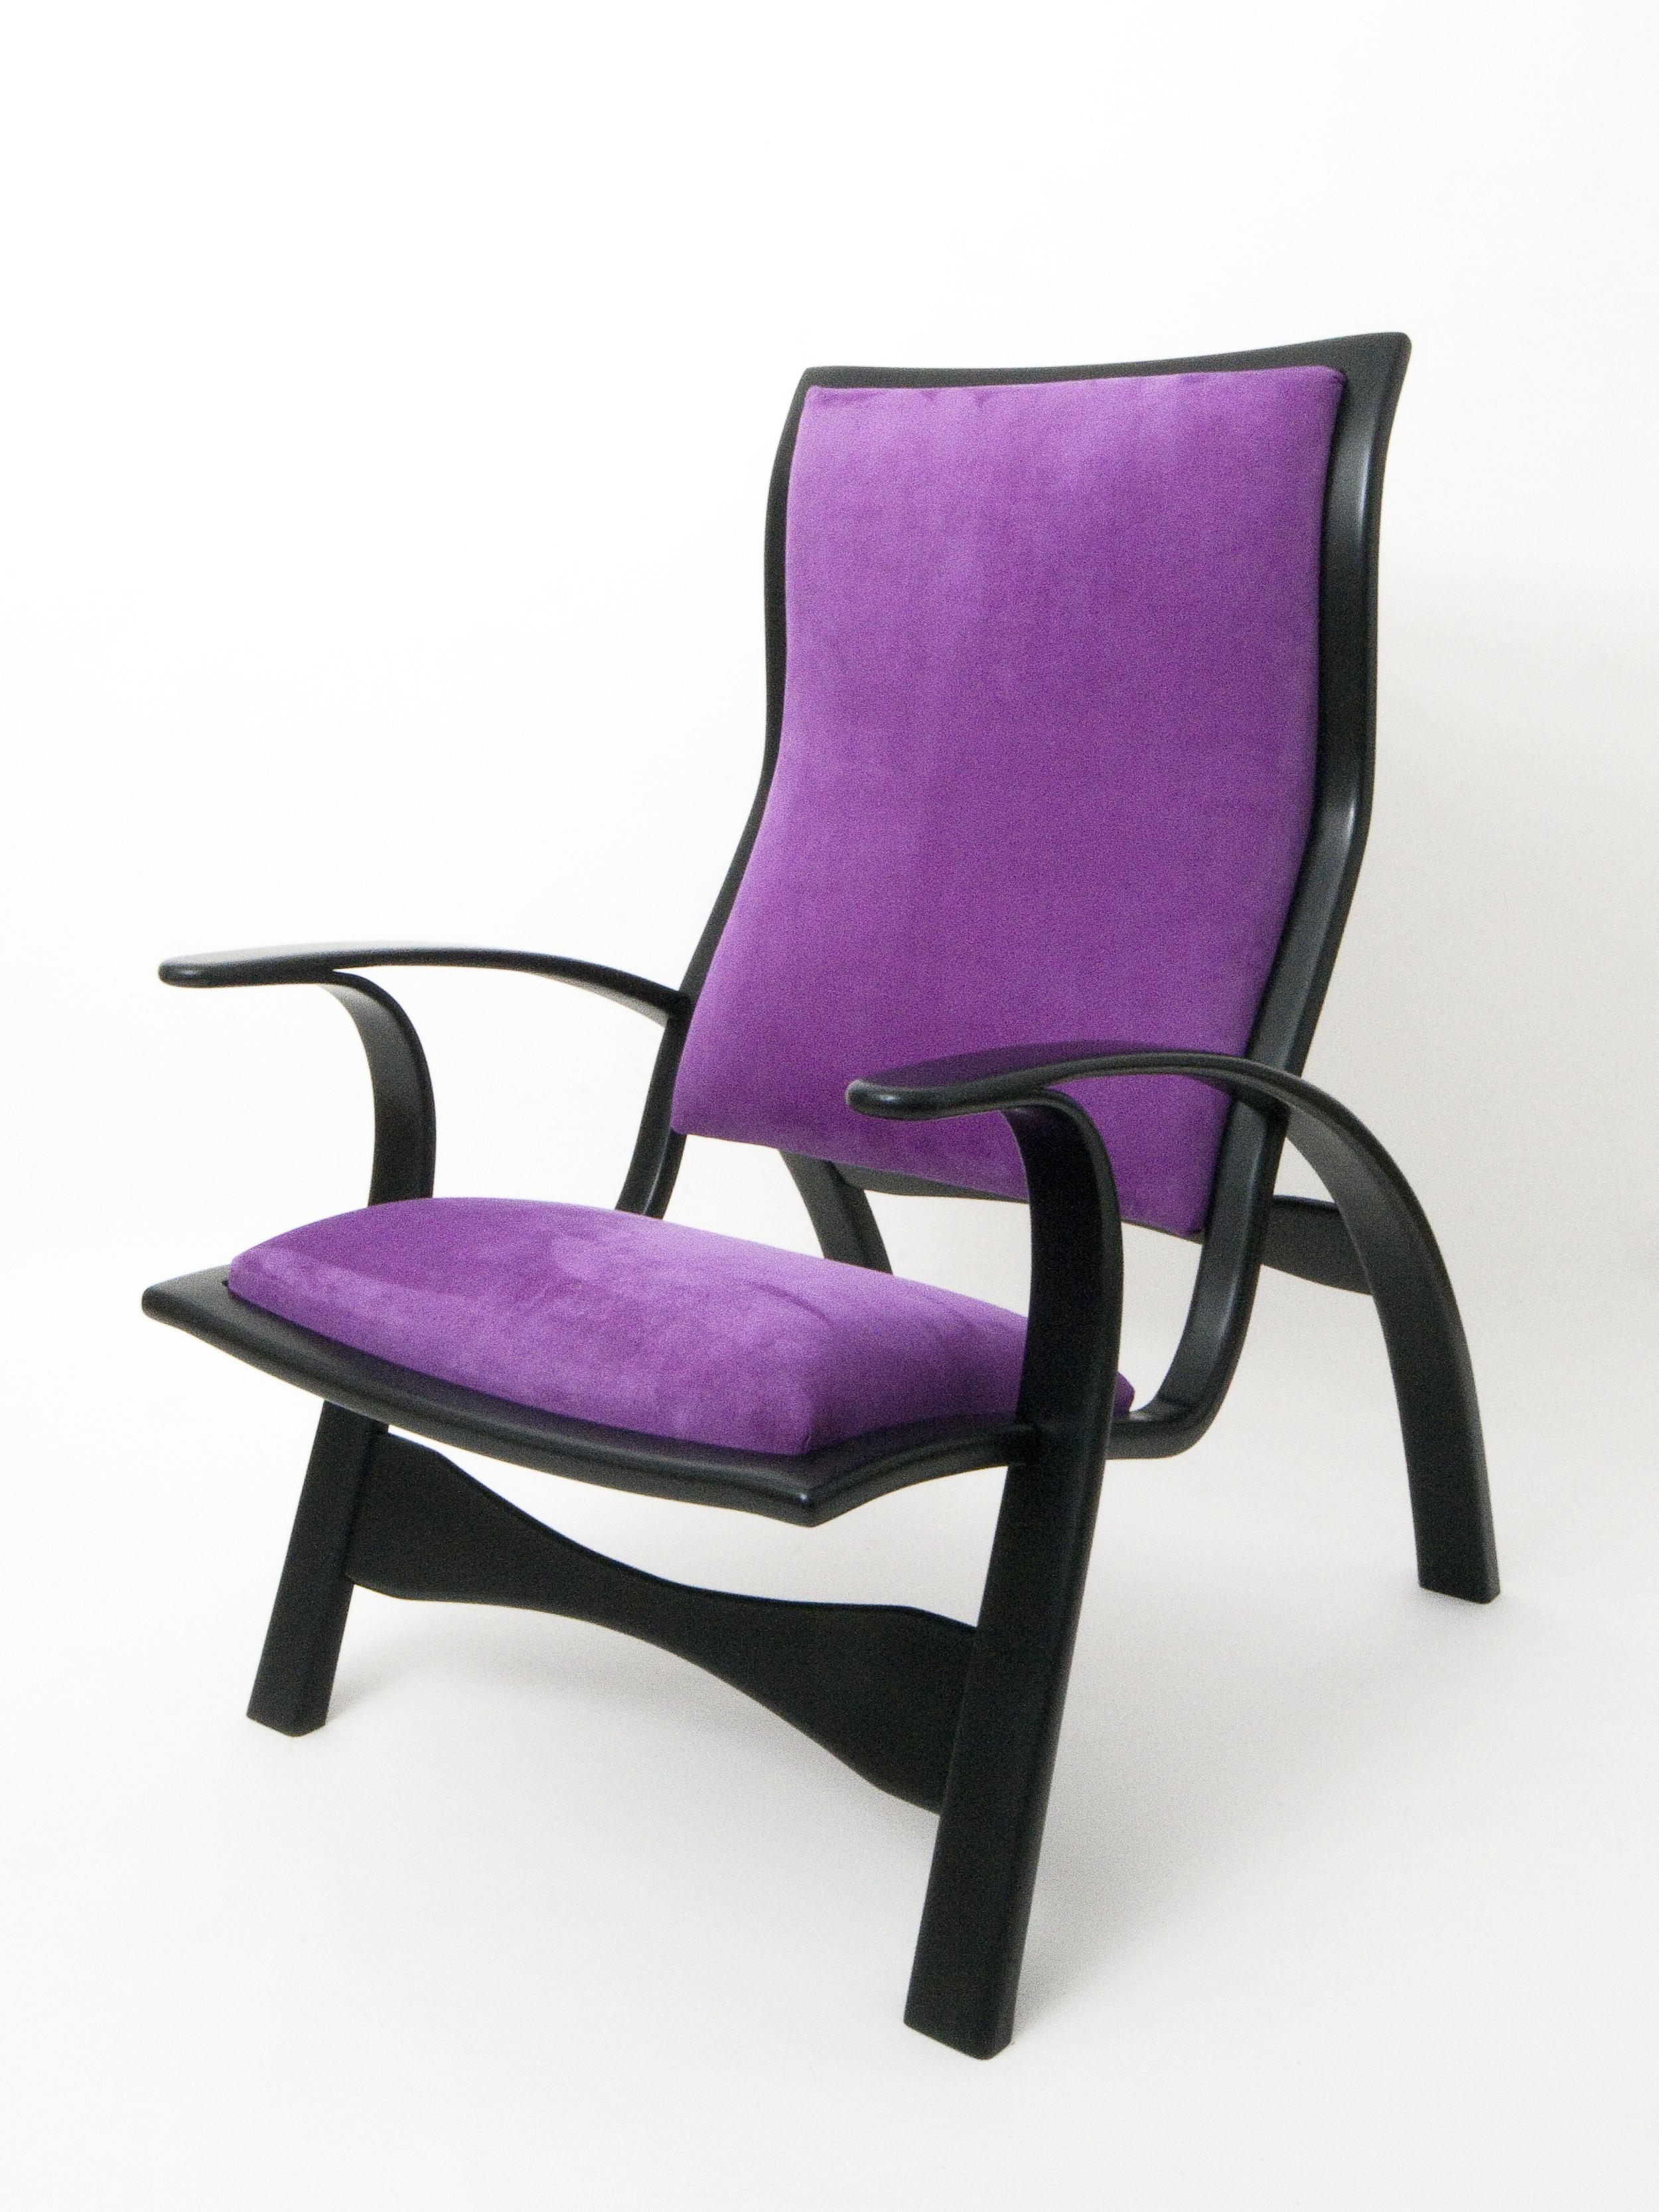 Crown royal chair3.jpg